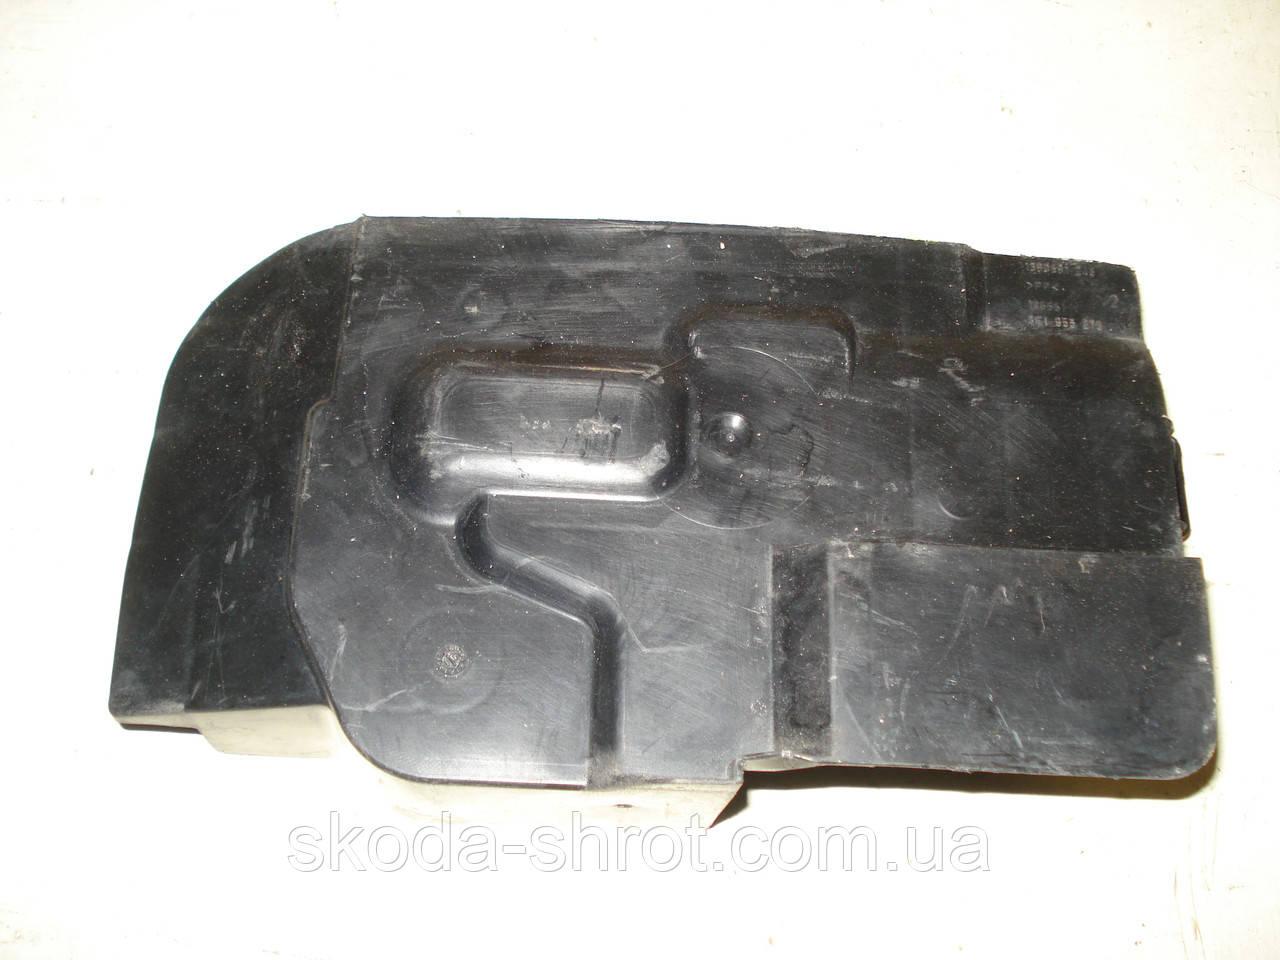 3C1 998 275 пластик на мотор трапеции Пассат Б-6